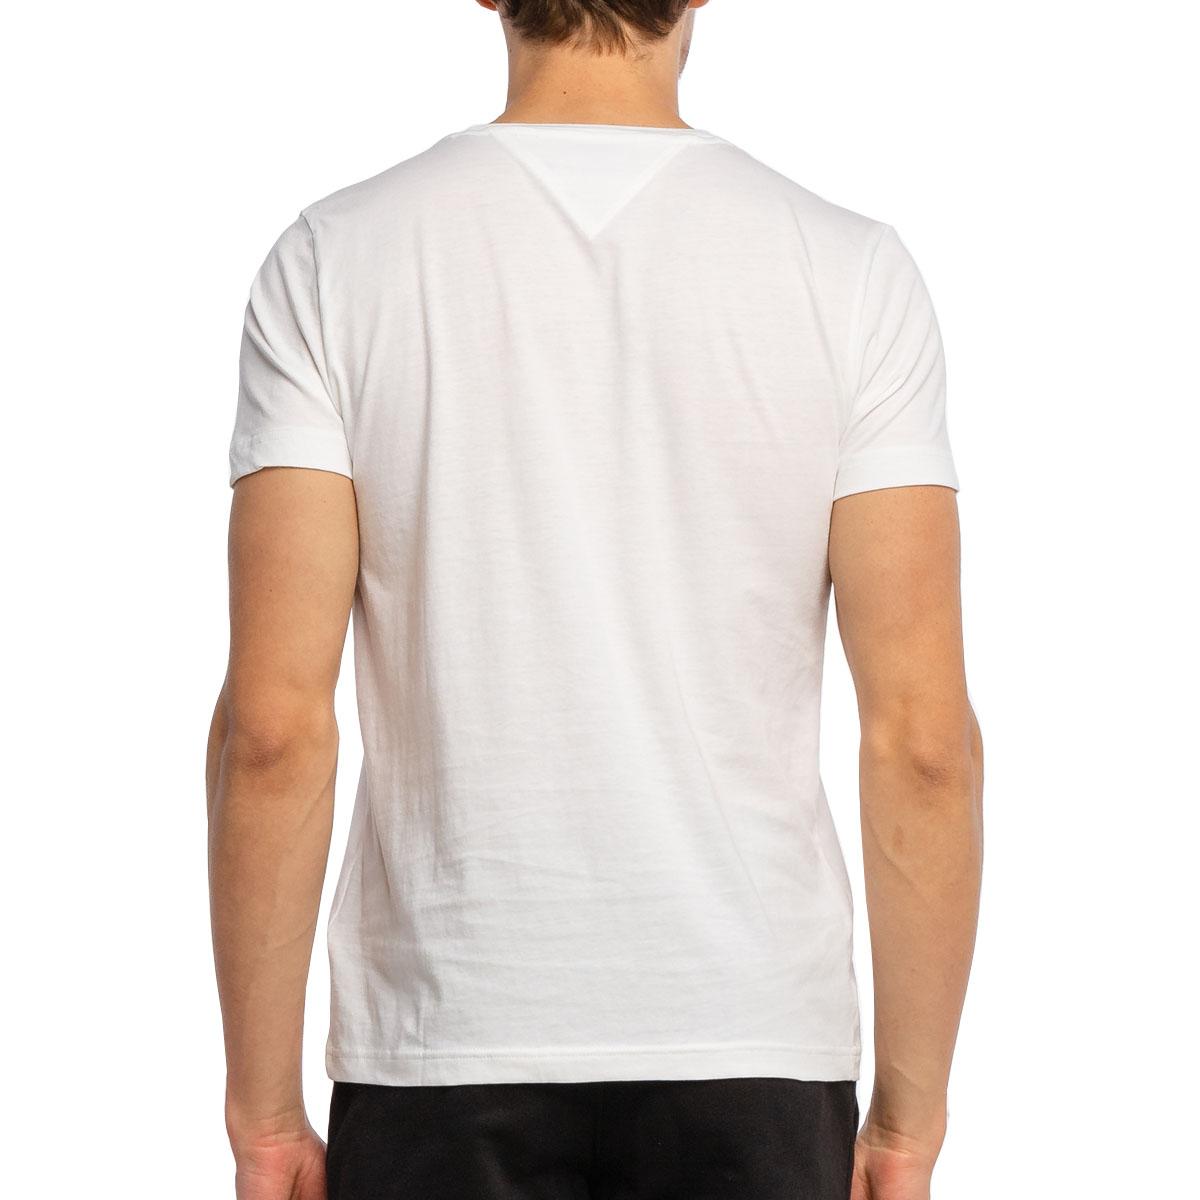 Camiseta Tommy Hilfiger logo Box Tee Branca